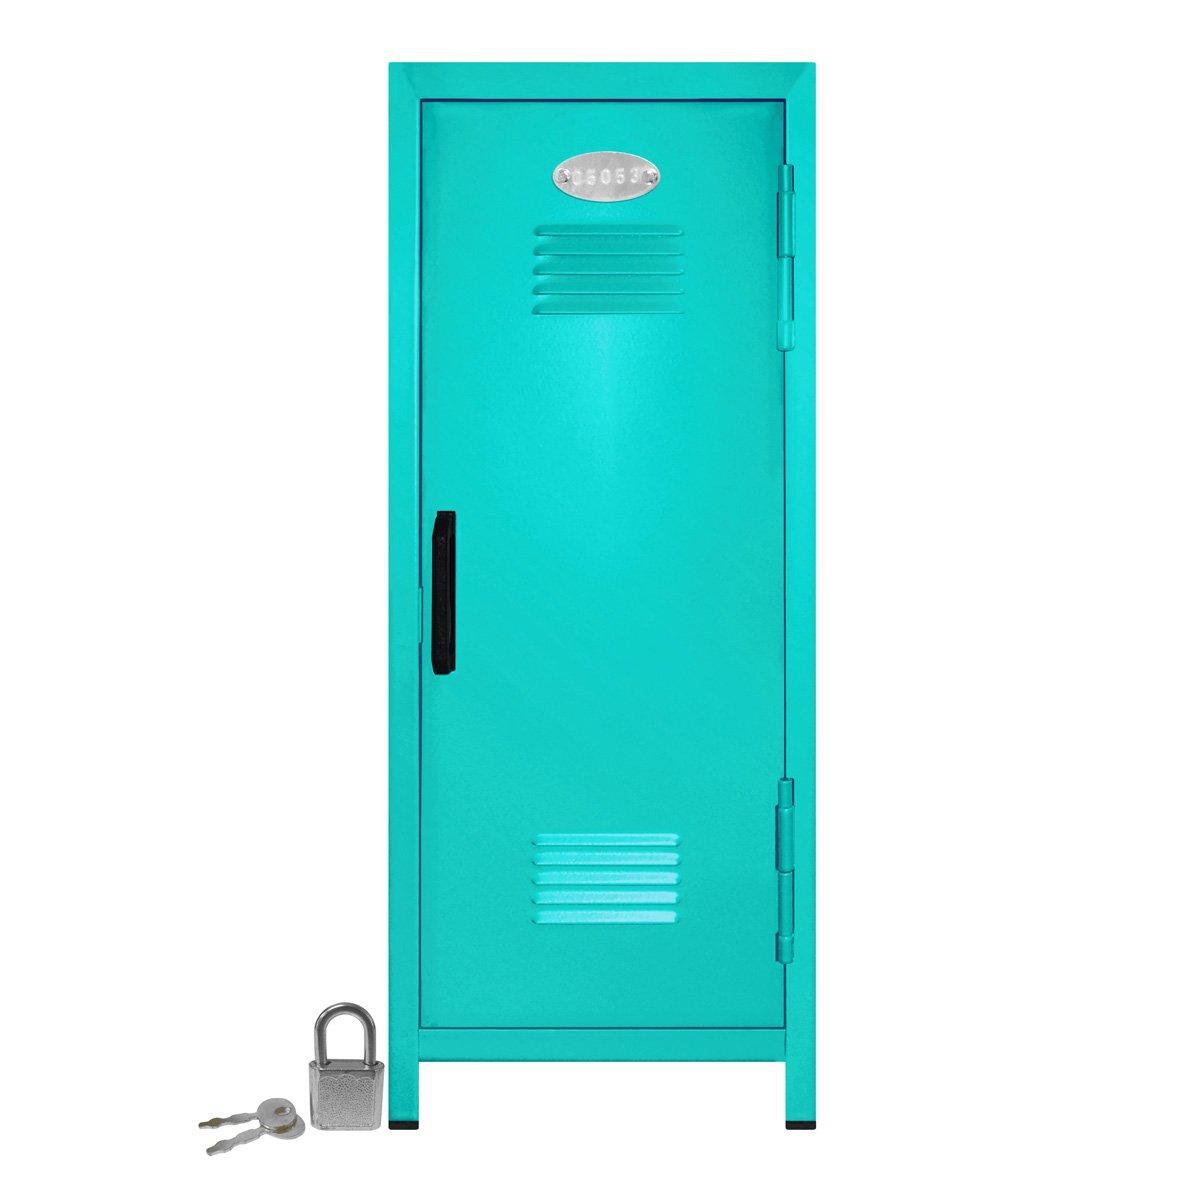 Mini Locker with Lock and Key Teal -10.75'' Tall x 4.125'' x 4.125'' by Mini Lockers by Magnetic Impressions